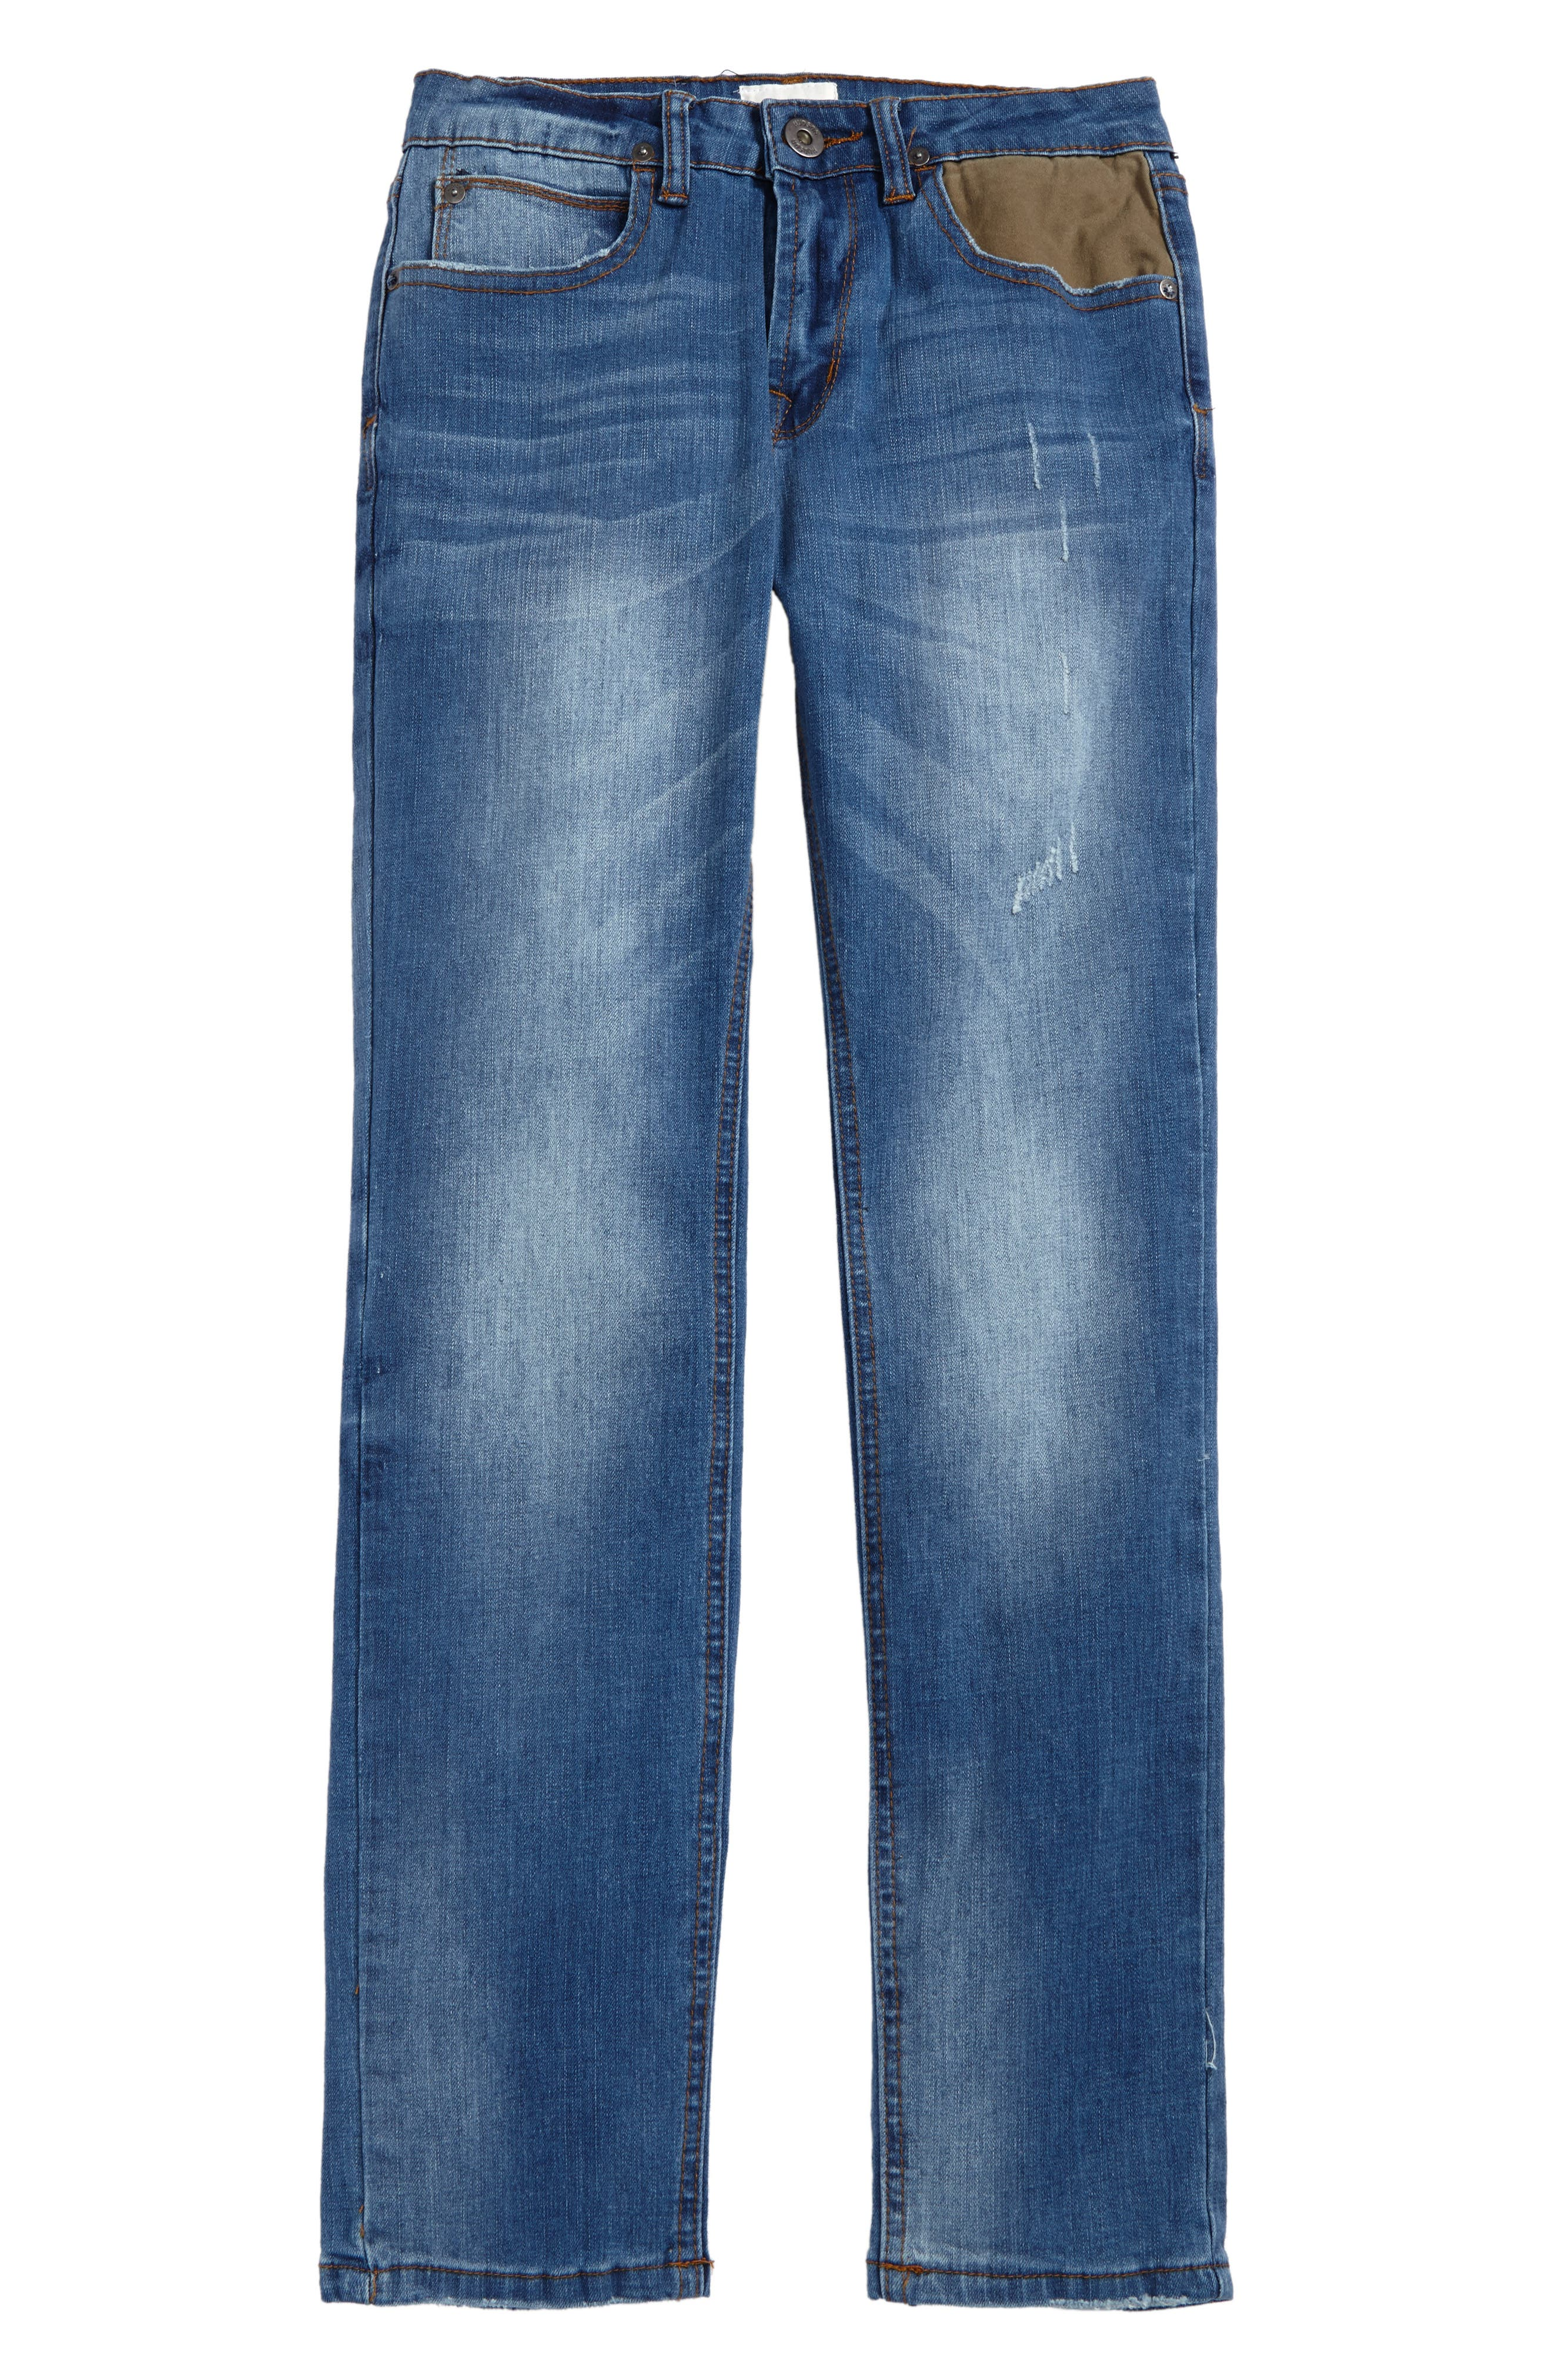 Main Image - Hudson Kids Jagger Slim Fit Straight Leg Jeans (Big Boys)